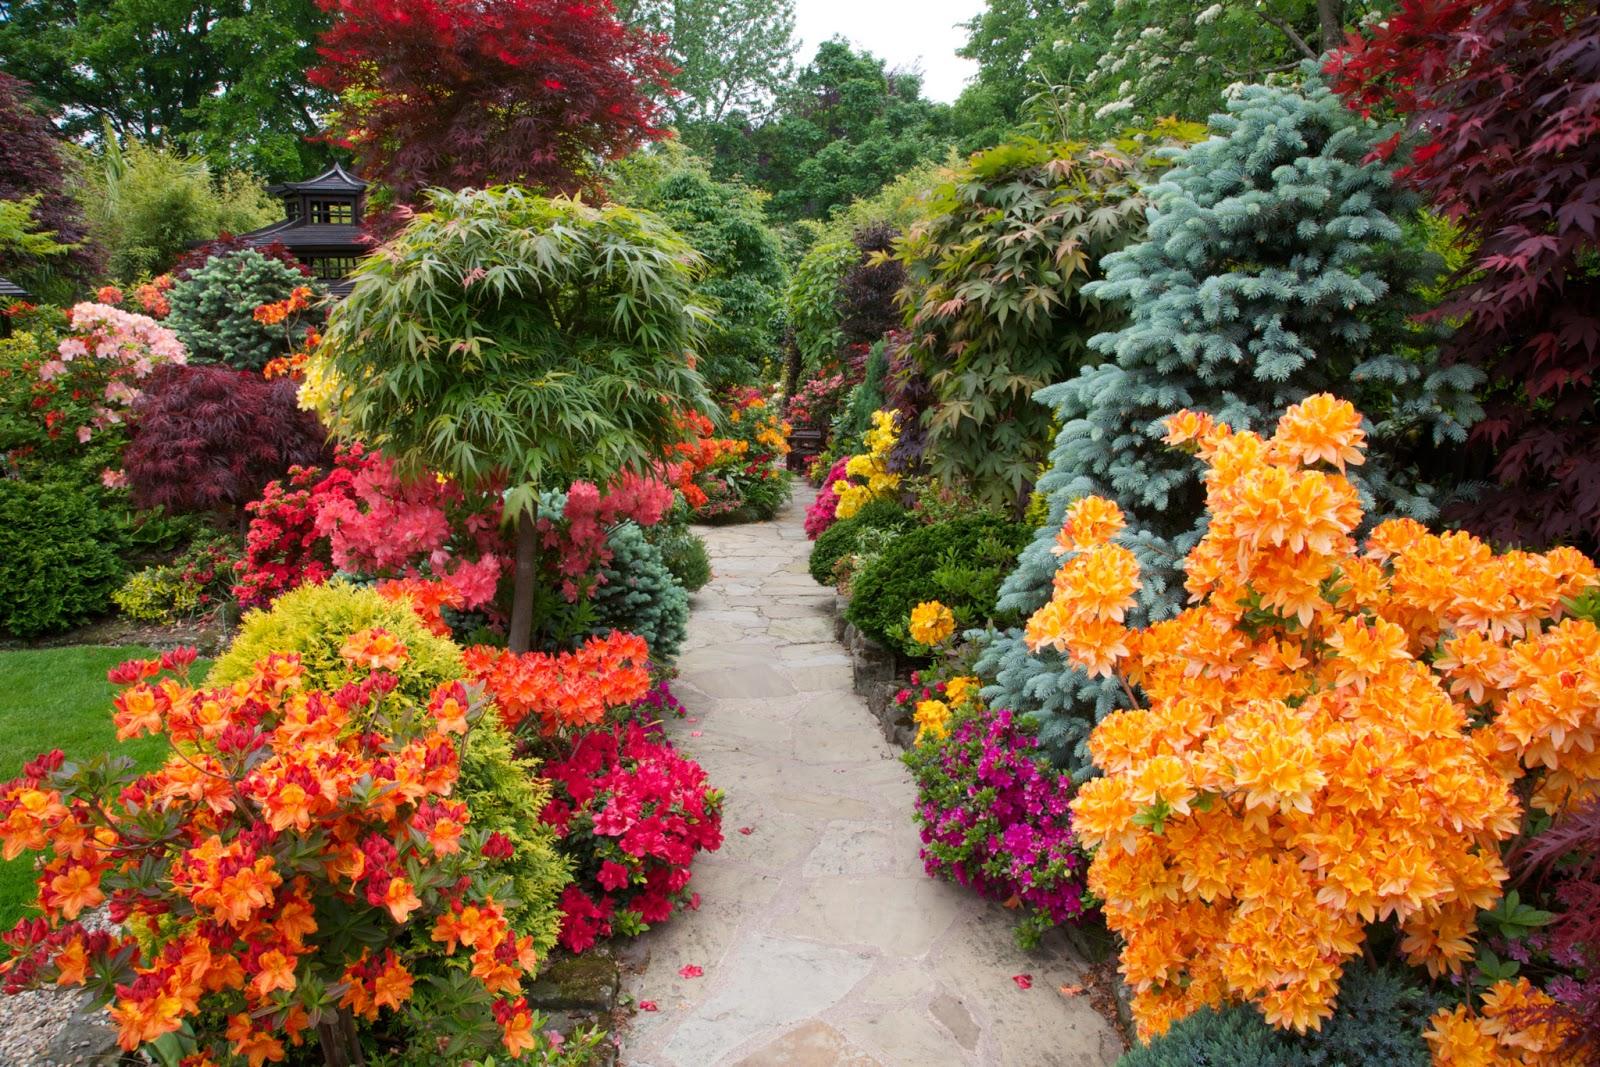 eleletsitz: top 10 most beautiful gardens in the world images